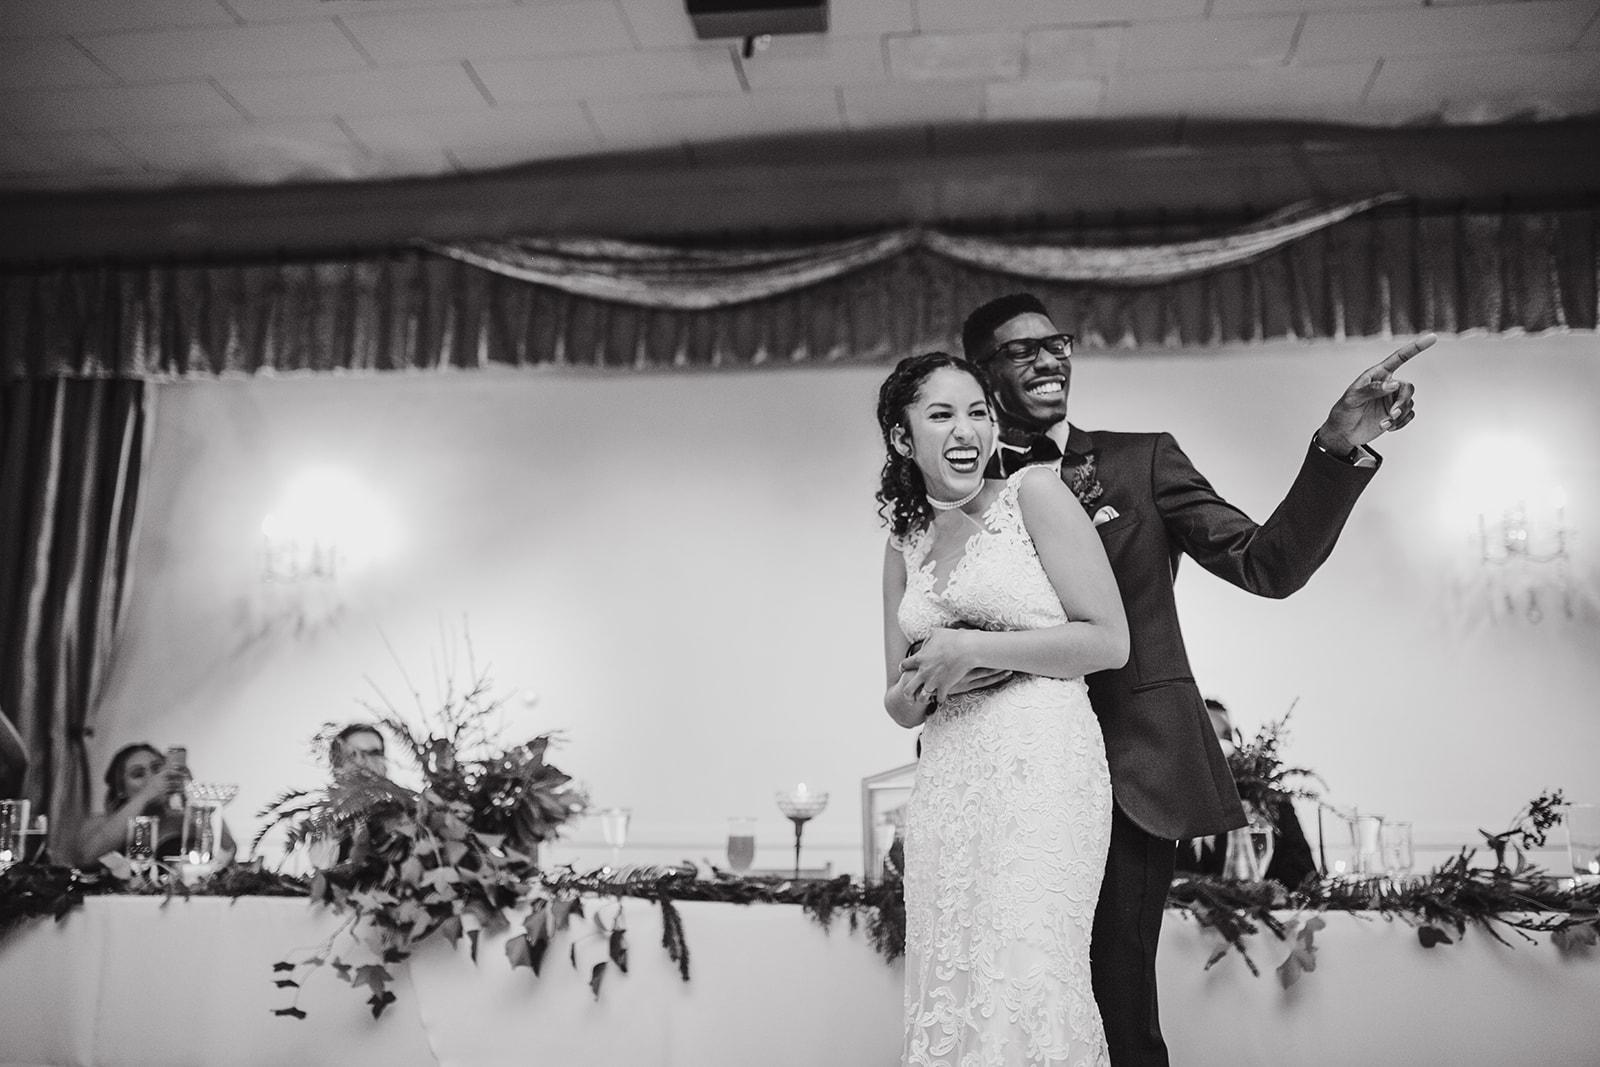 portland - wedding - photographer - doorofhopechurch596.jpg